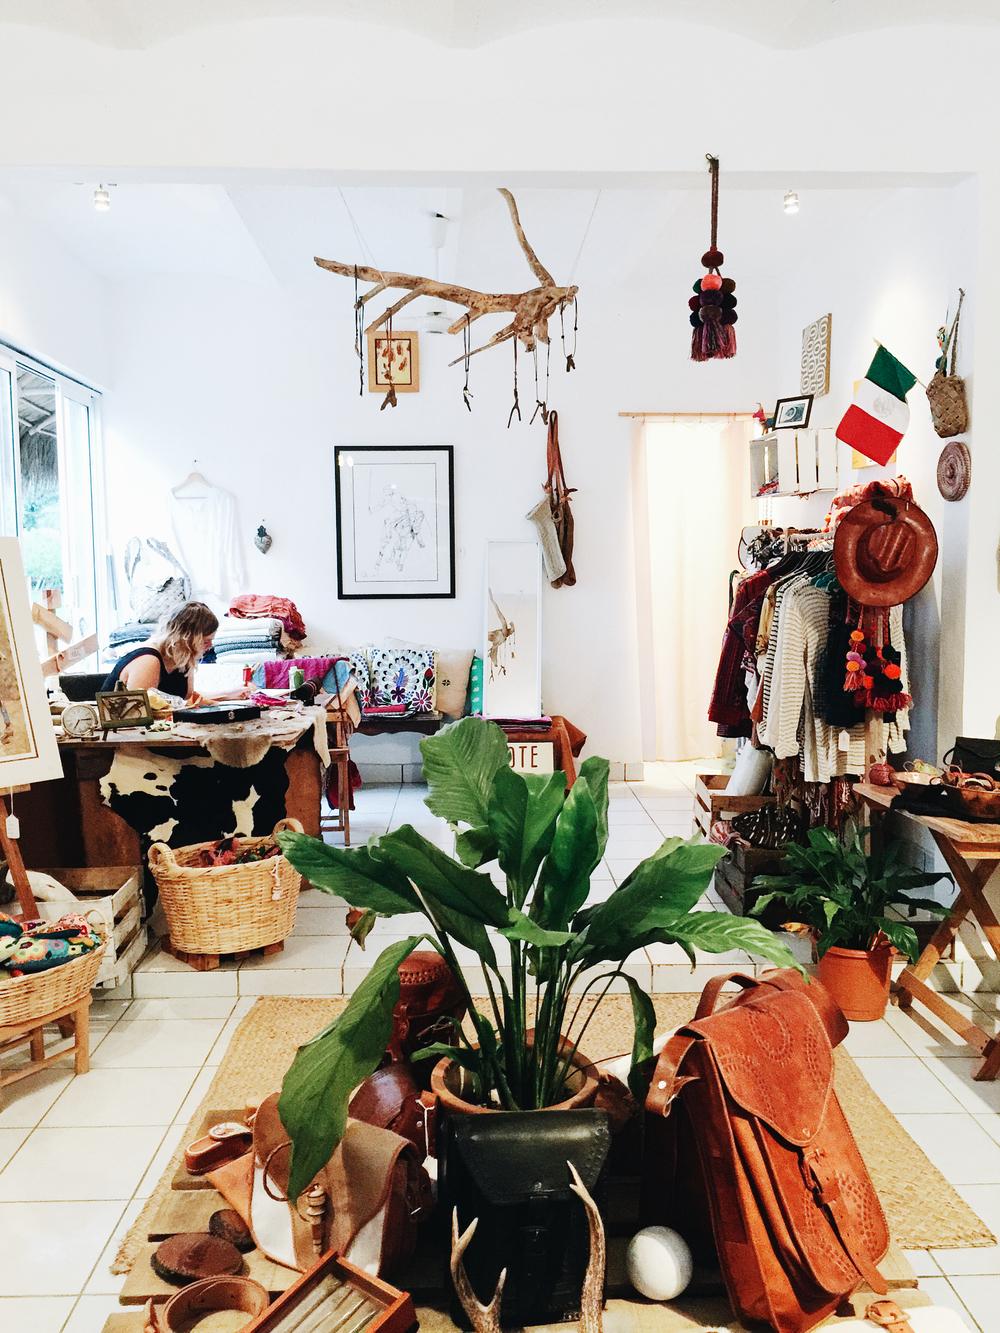 Elote Arte in San Pancho